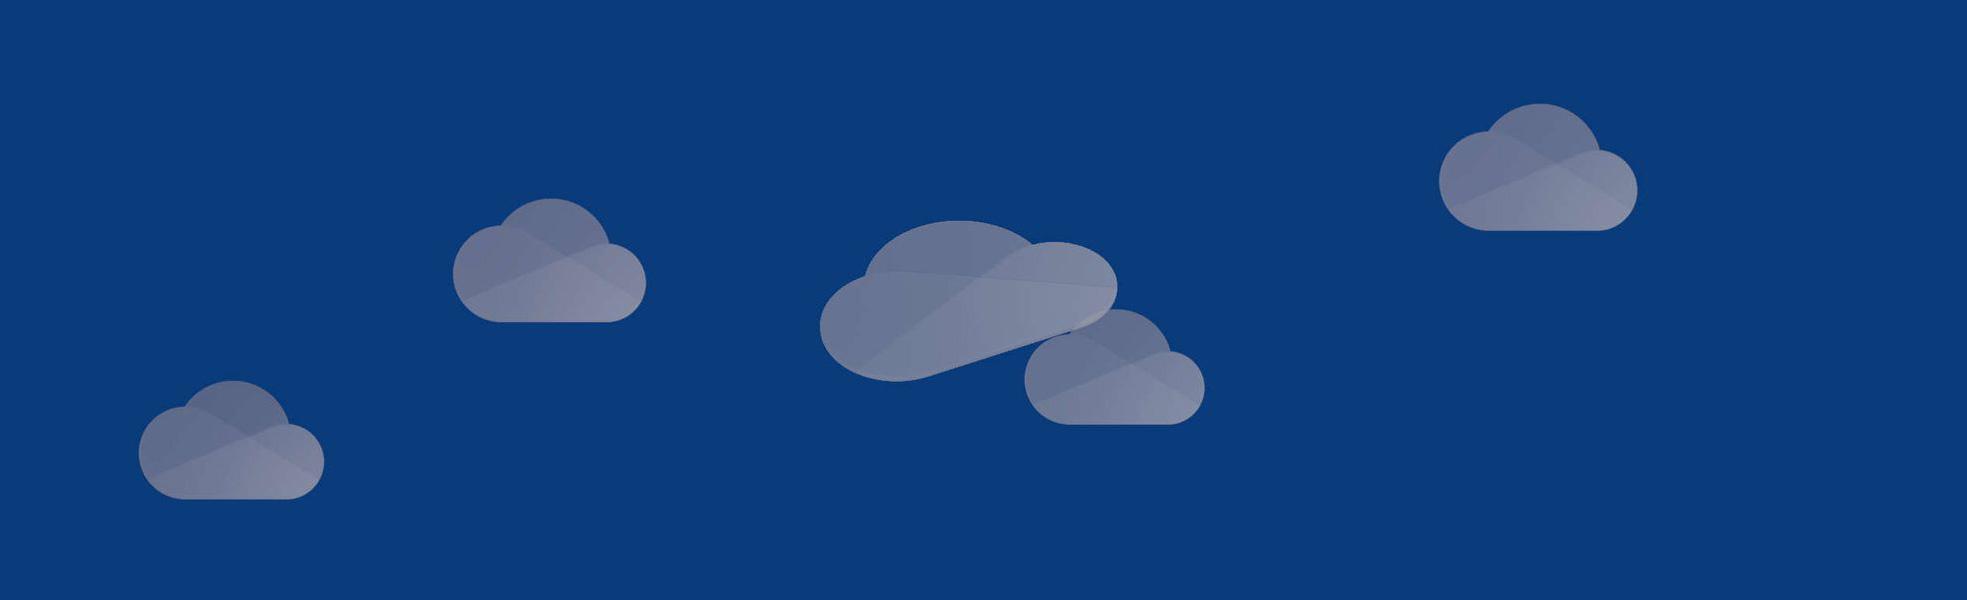 Microsoft OneDrive banner image